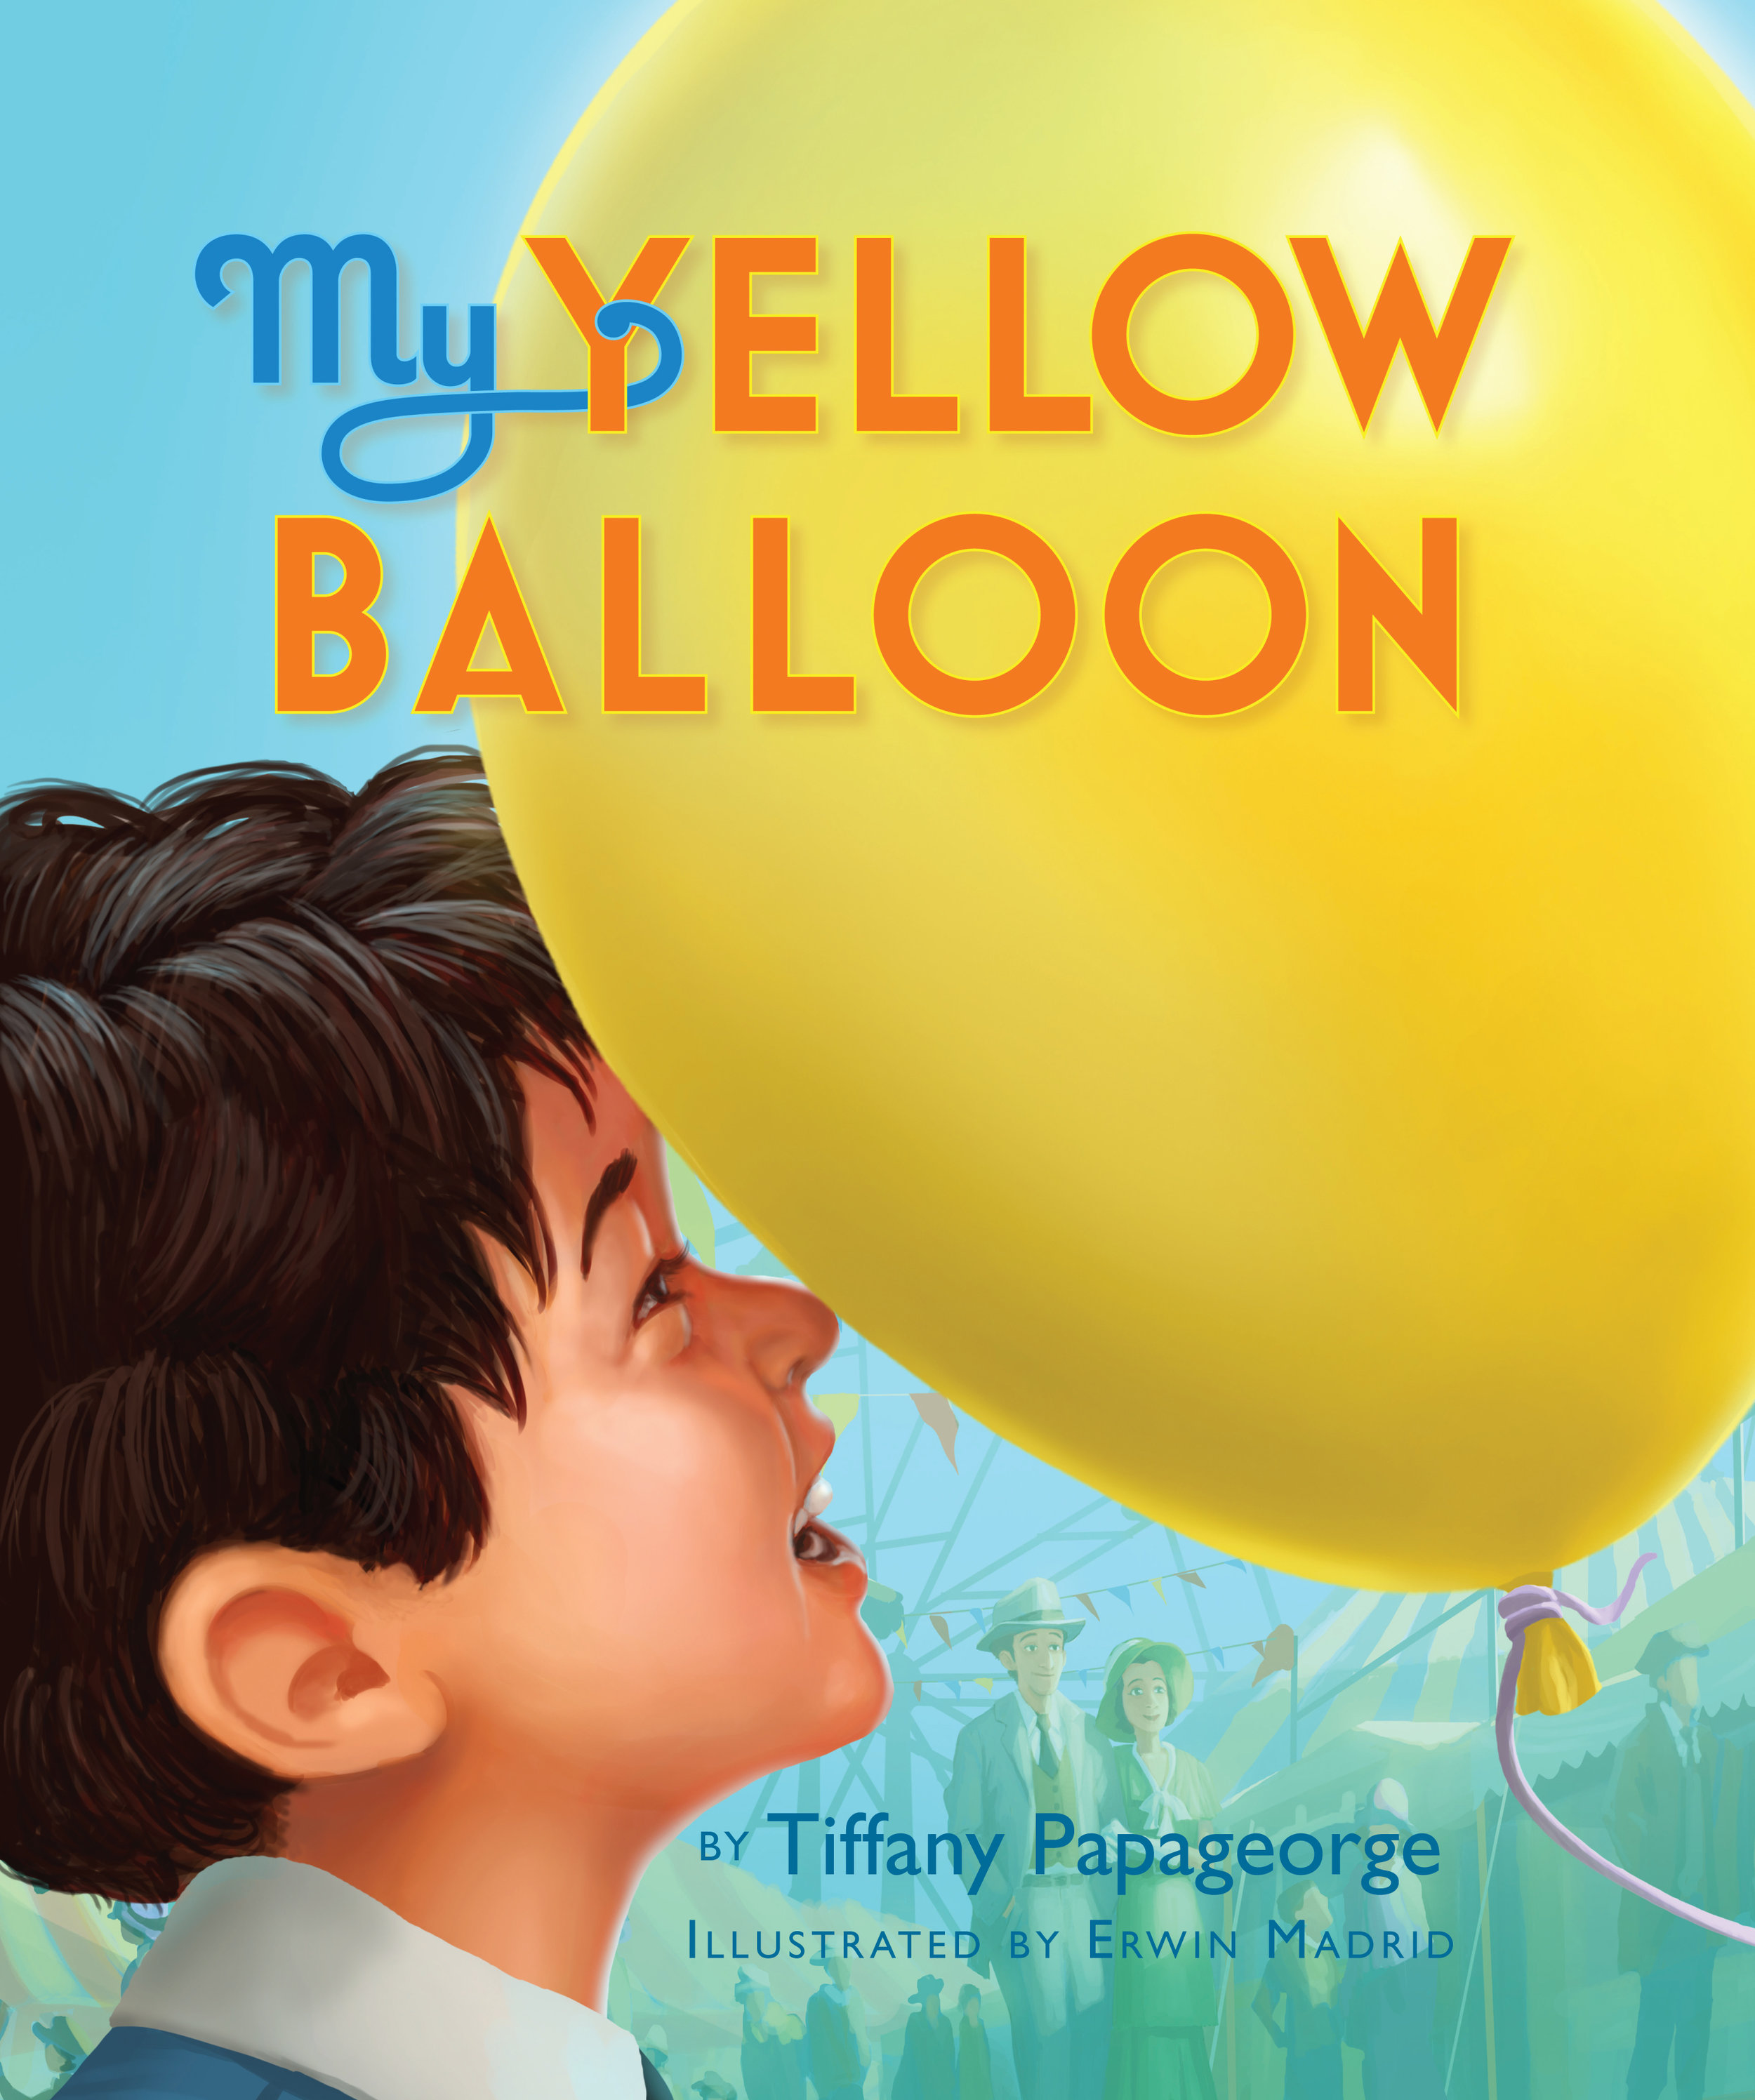 Yellow-balloon-cover-Eng-300.jpg